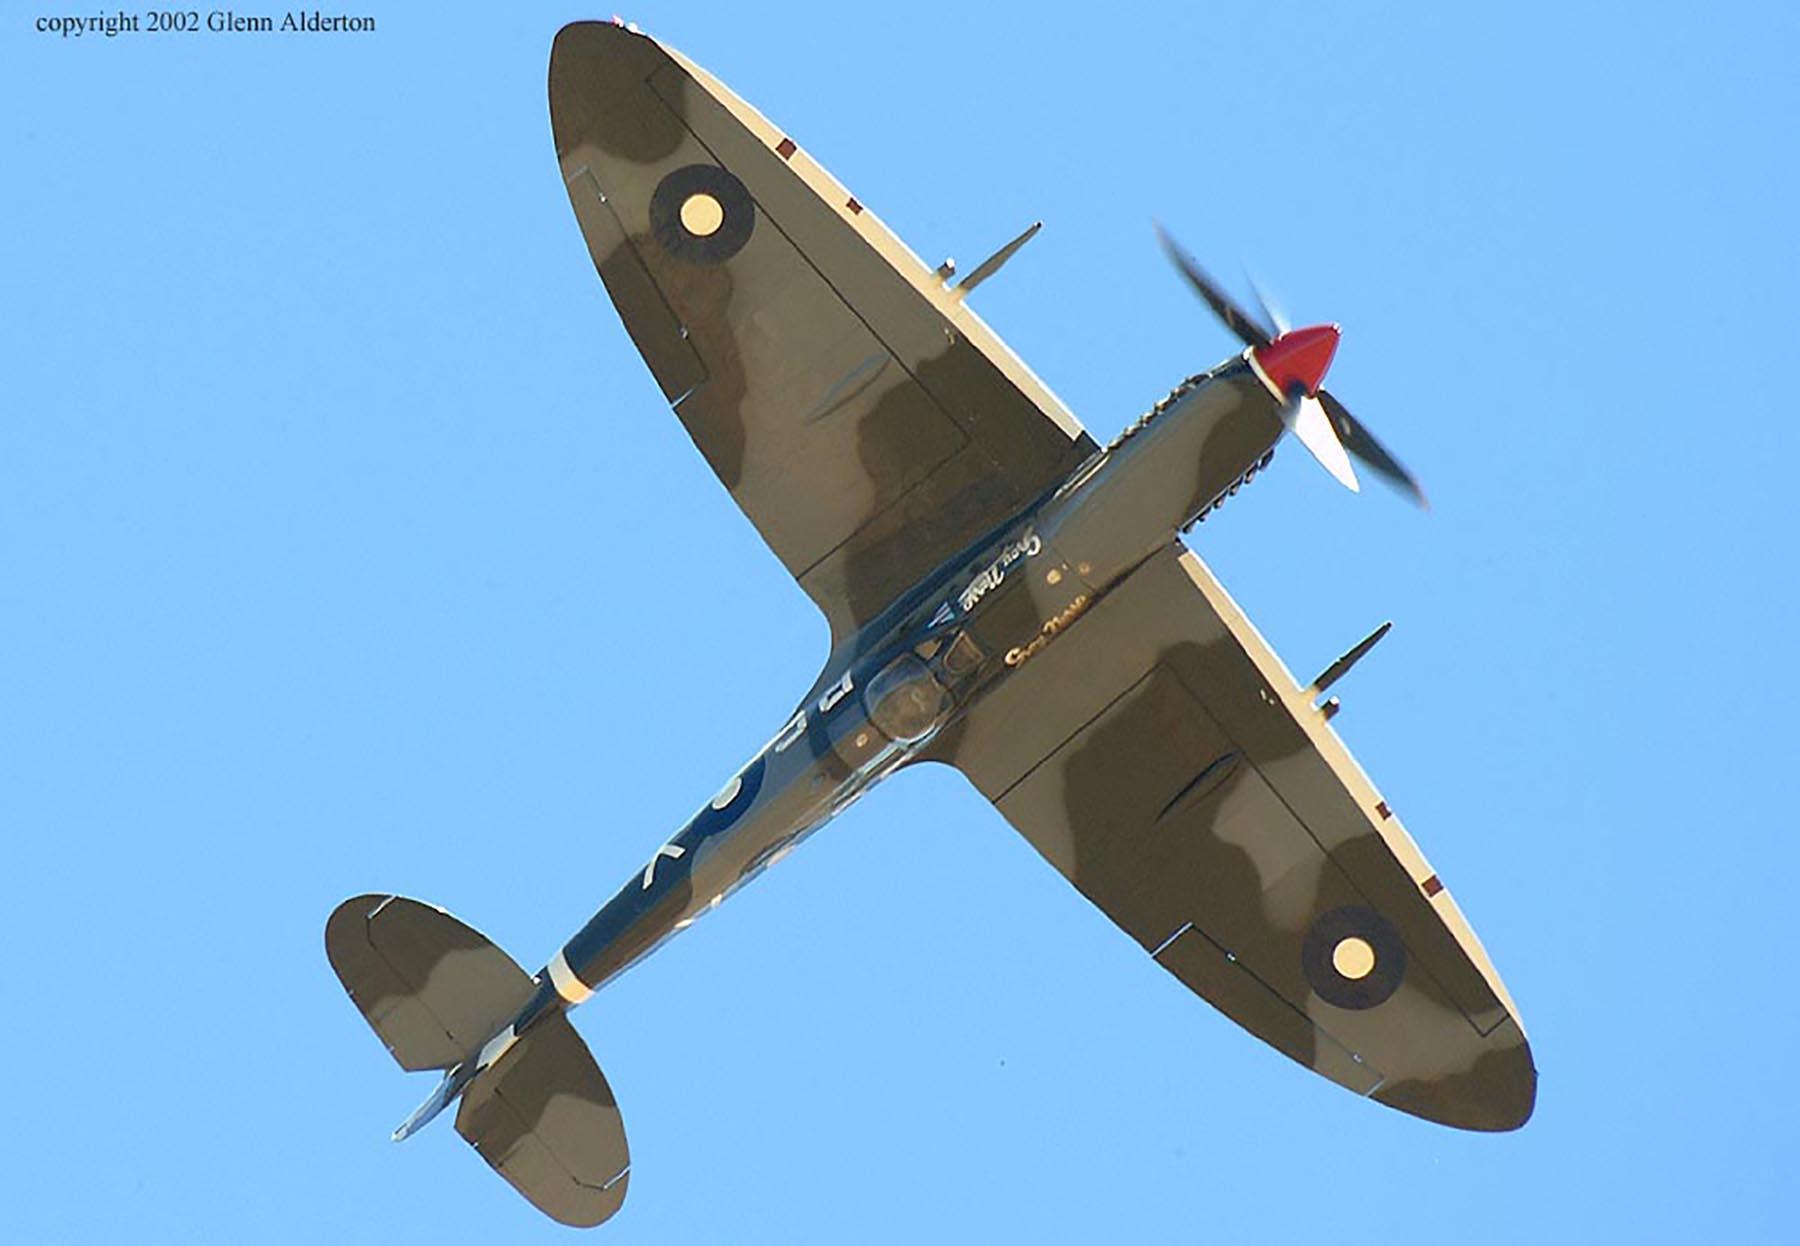 Airworthy Spitfire warbird RAAF 457Sqn RGV A58 602 04